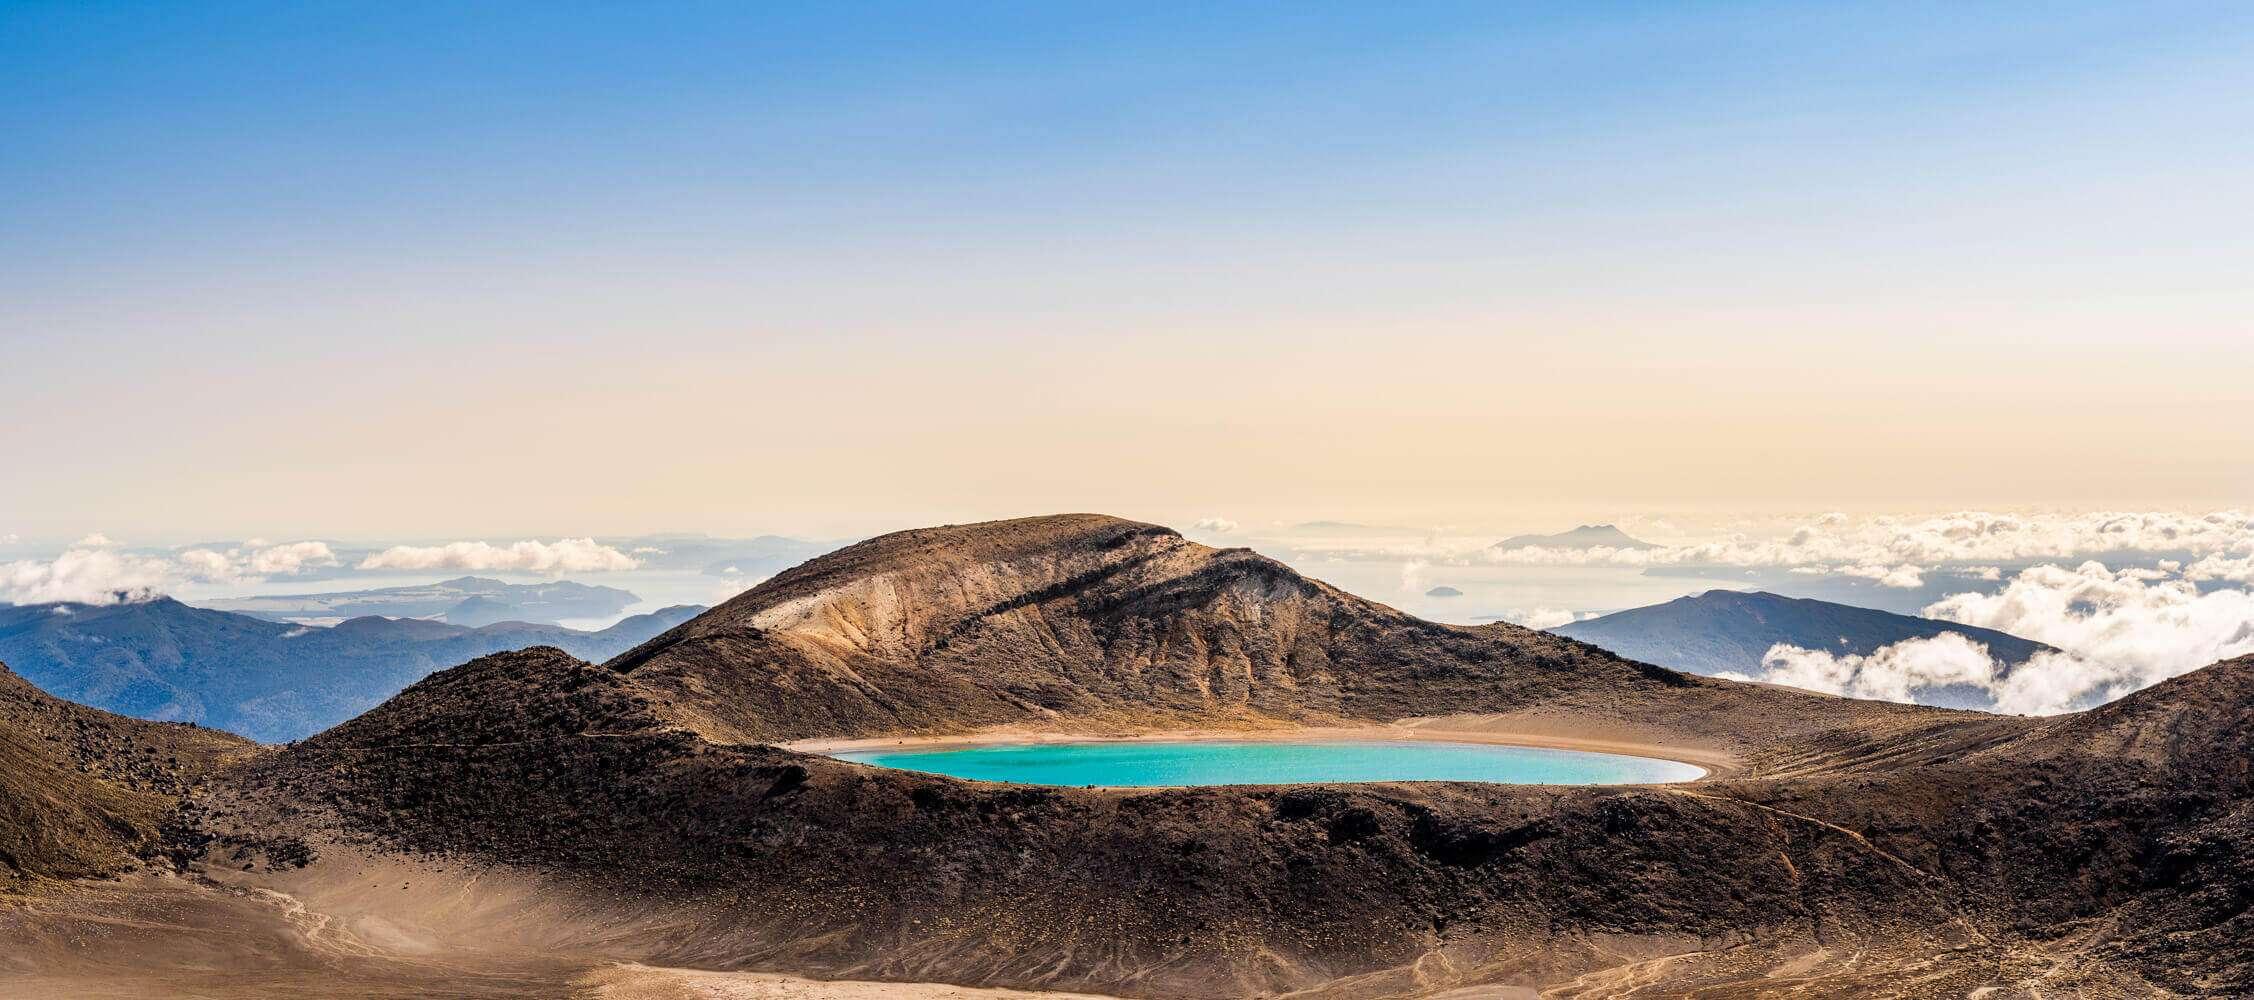 Neuseeland Urlaub Stefan Franke 2019 47